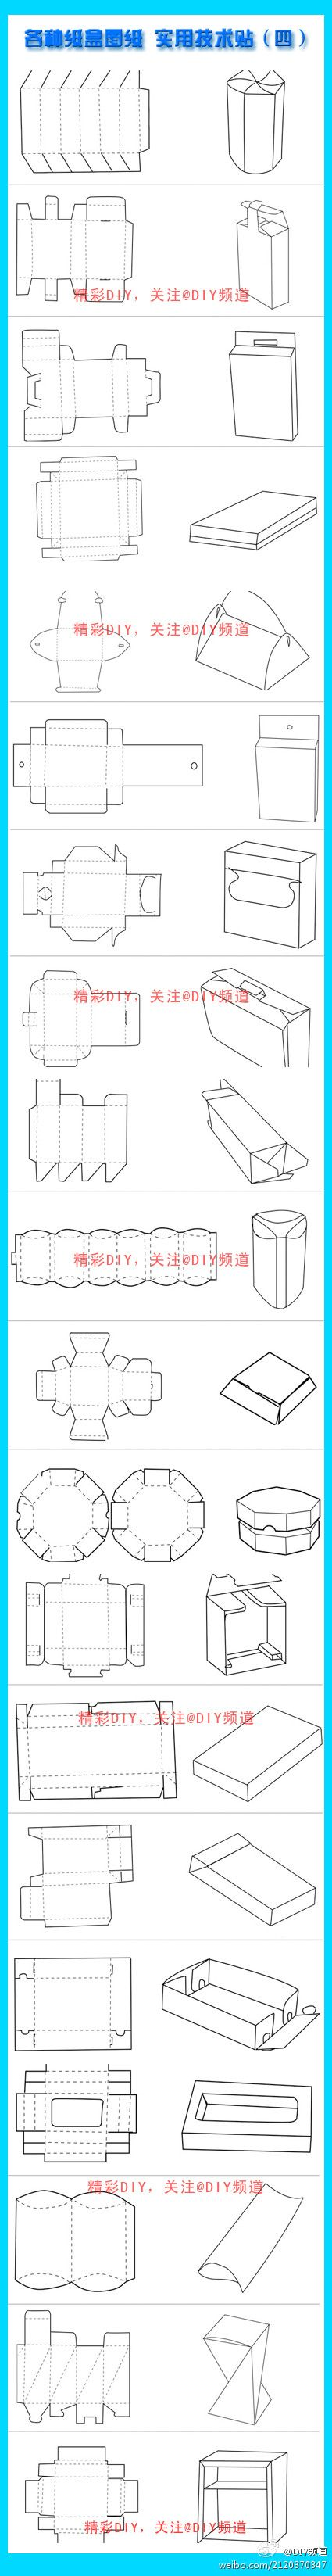 Making boxes etc http://pinterest.com/claudiagillemos/passo-a-passo/ more paper cartons